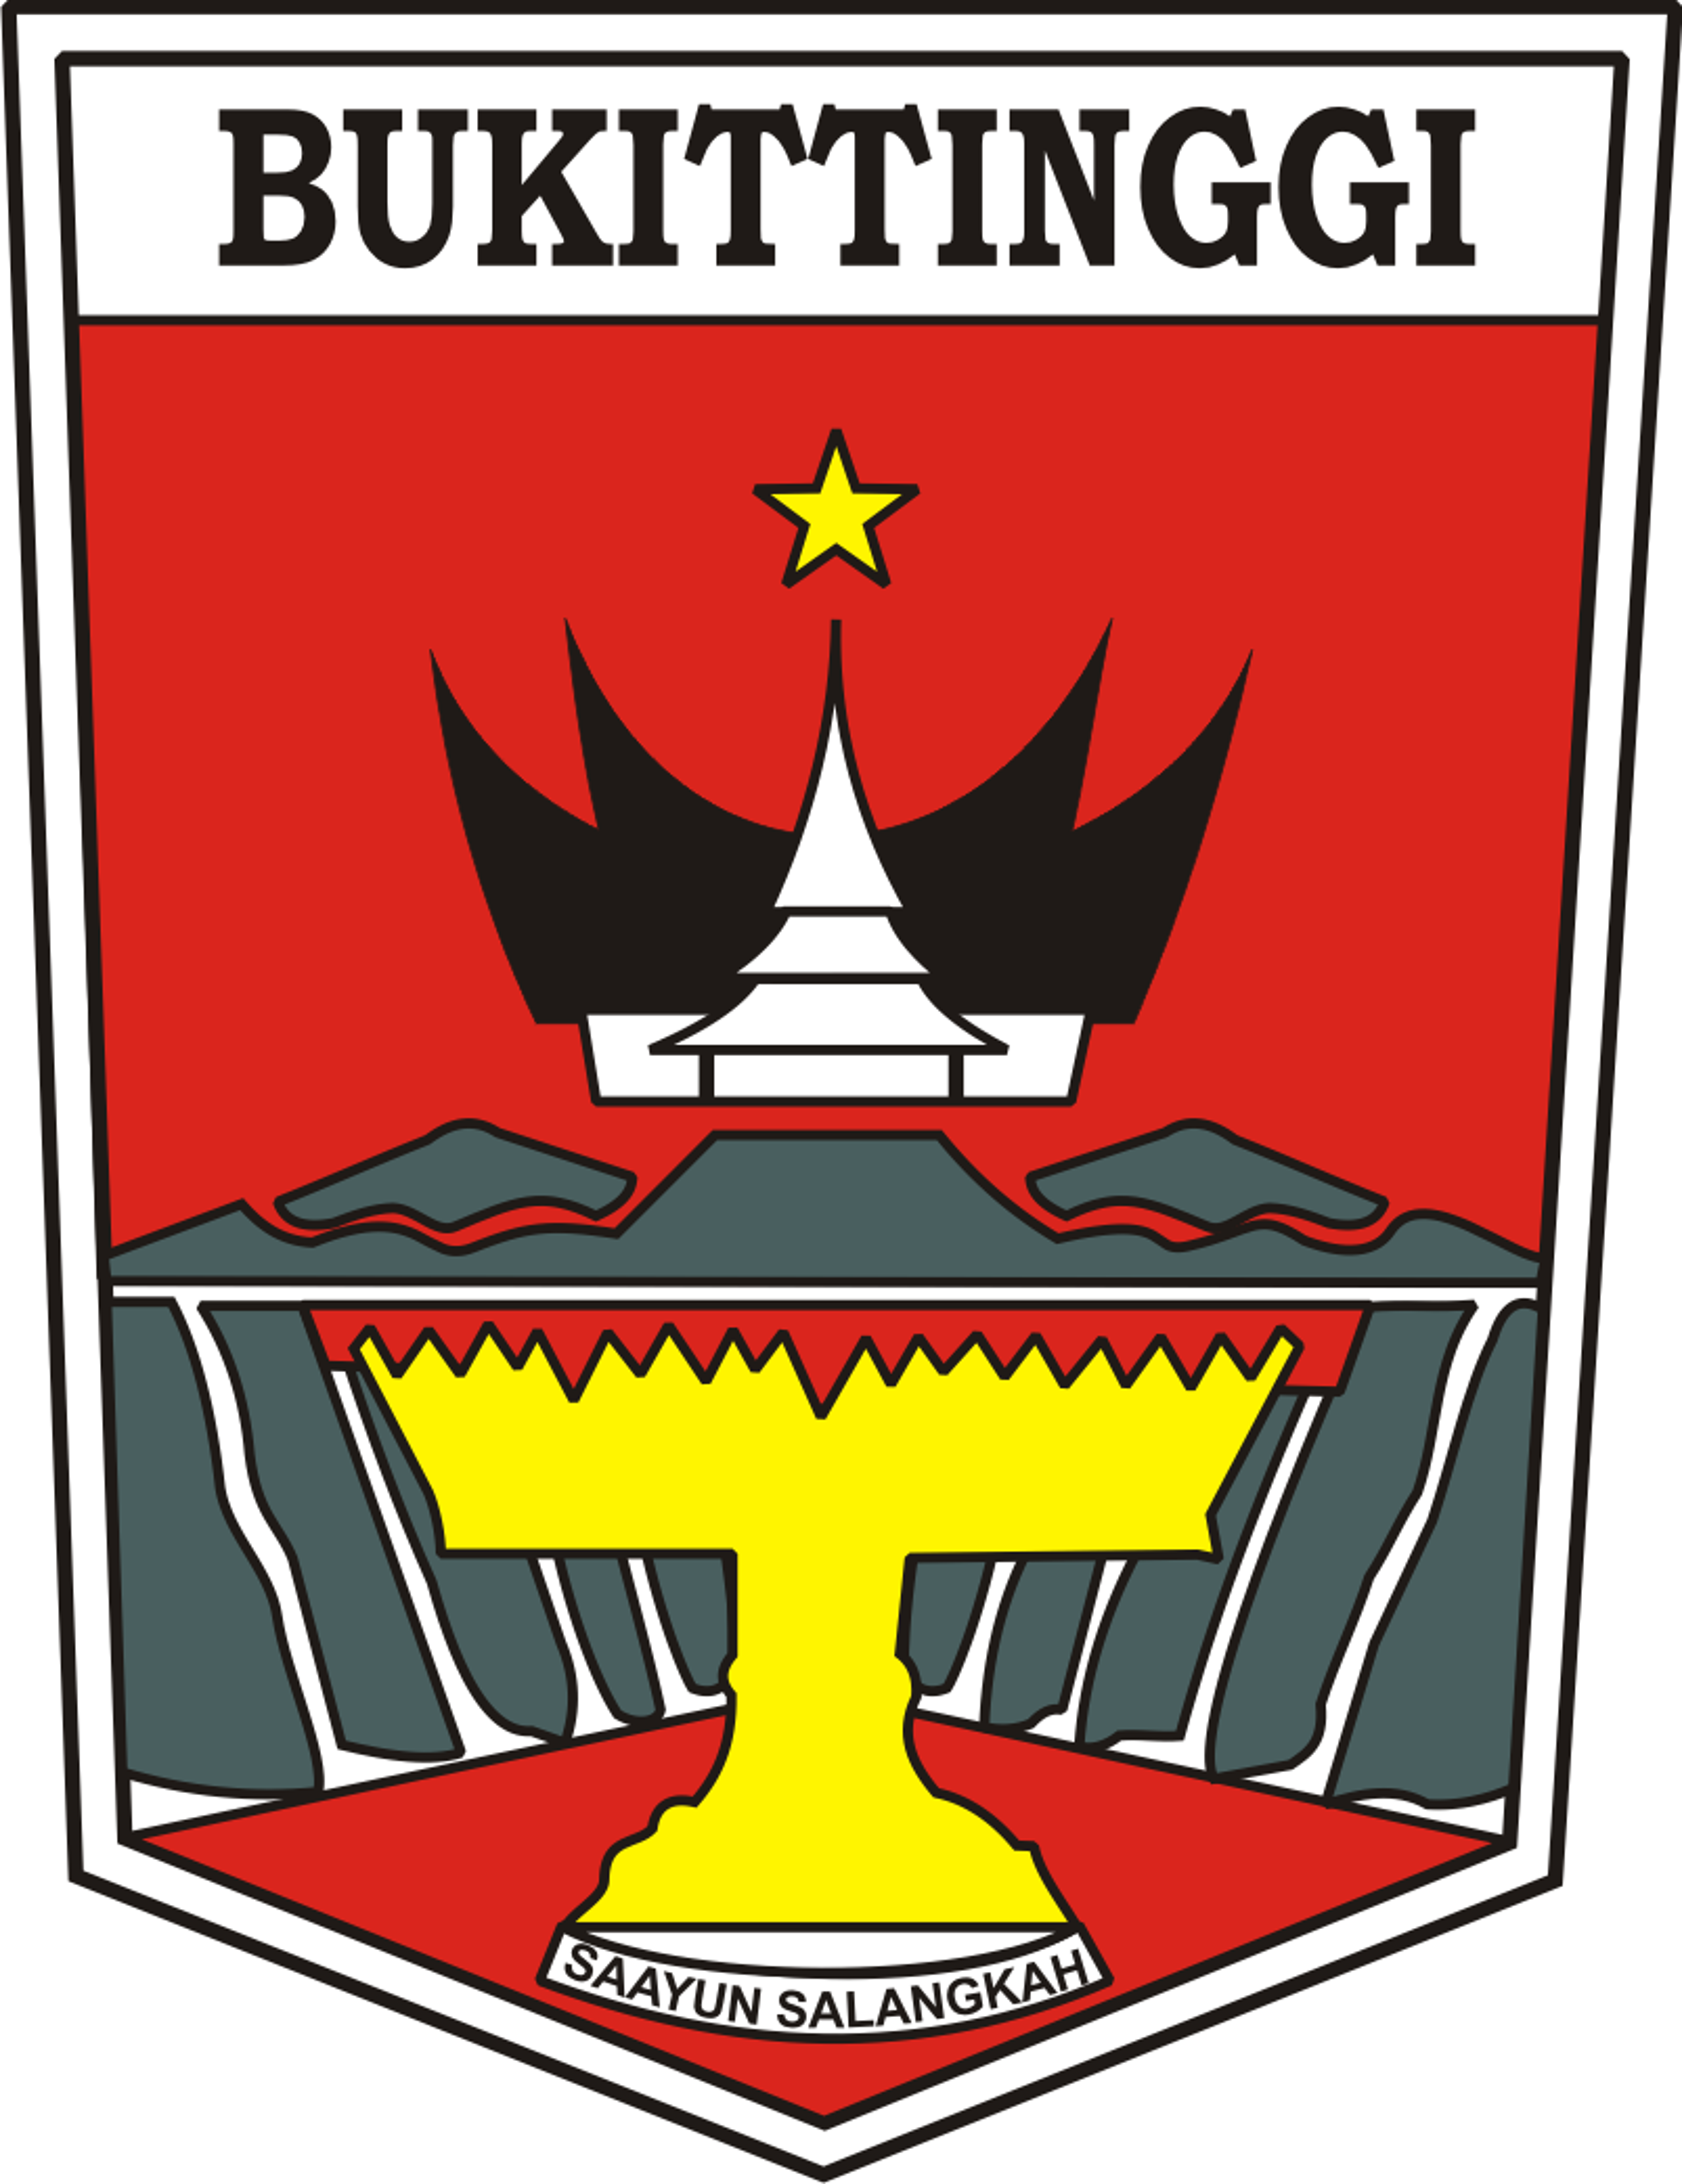 Berkas Logo Kota Bukittinggi Png Wikipedia Bahasa Indonesia Ensiklopedia Bebas